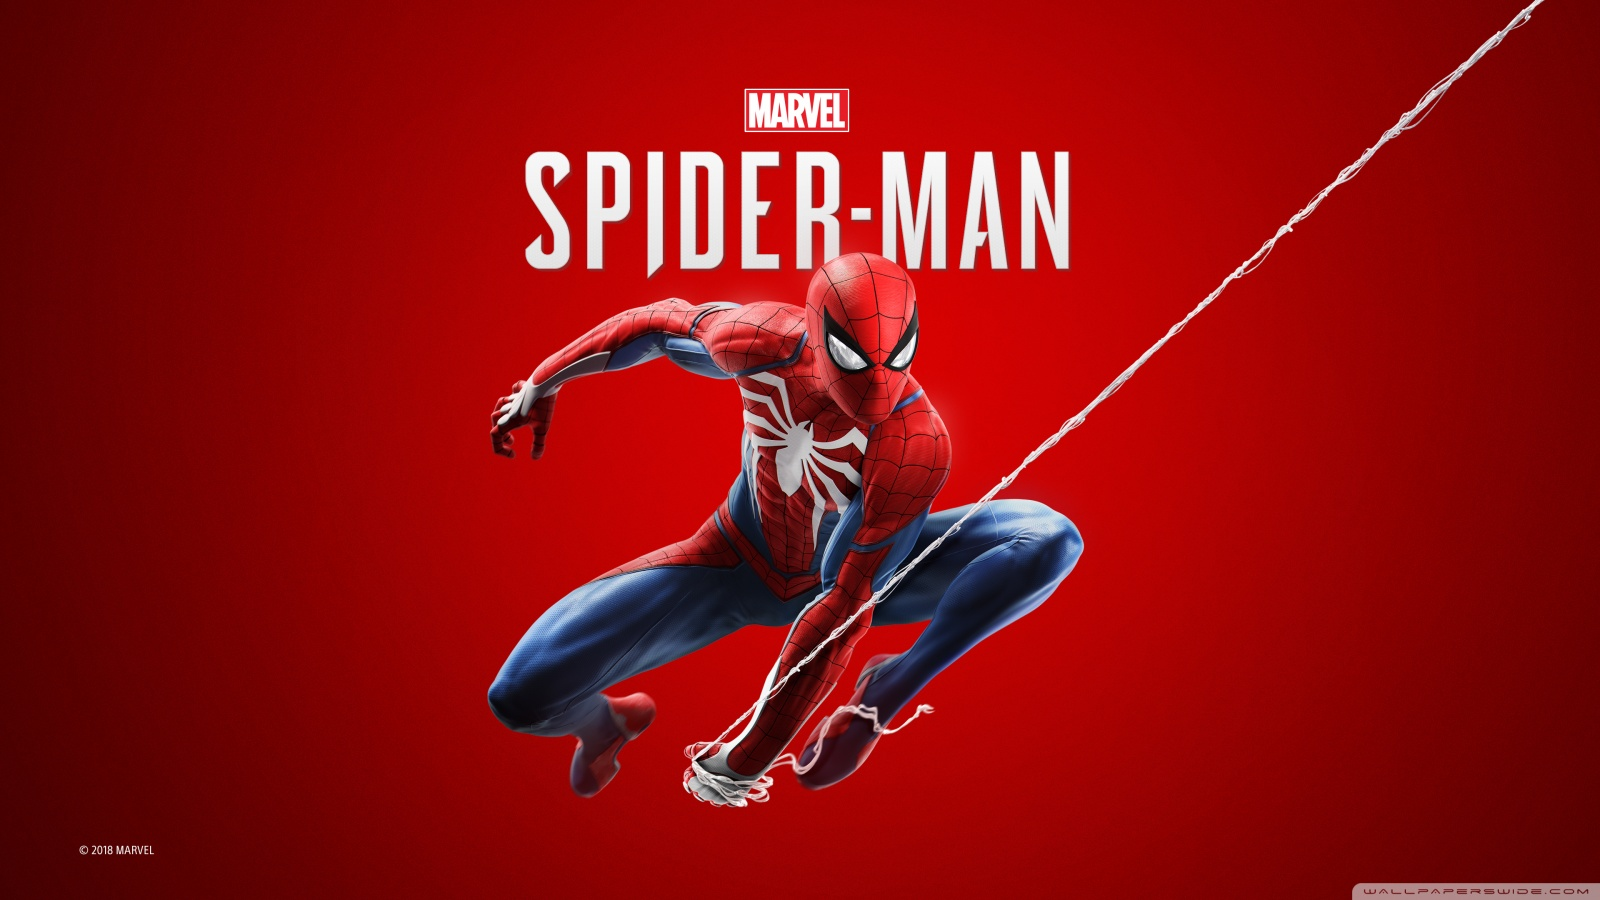 Download Wallpaper Spiderman Hd Spider Man 2018 Video Game 4k Hd Desktop Wallpaper For 4k